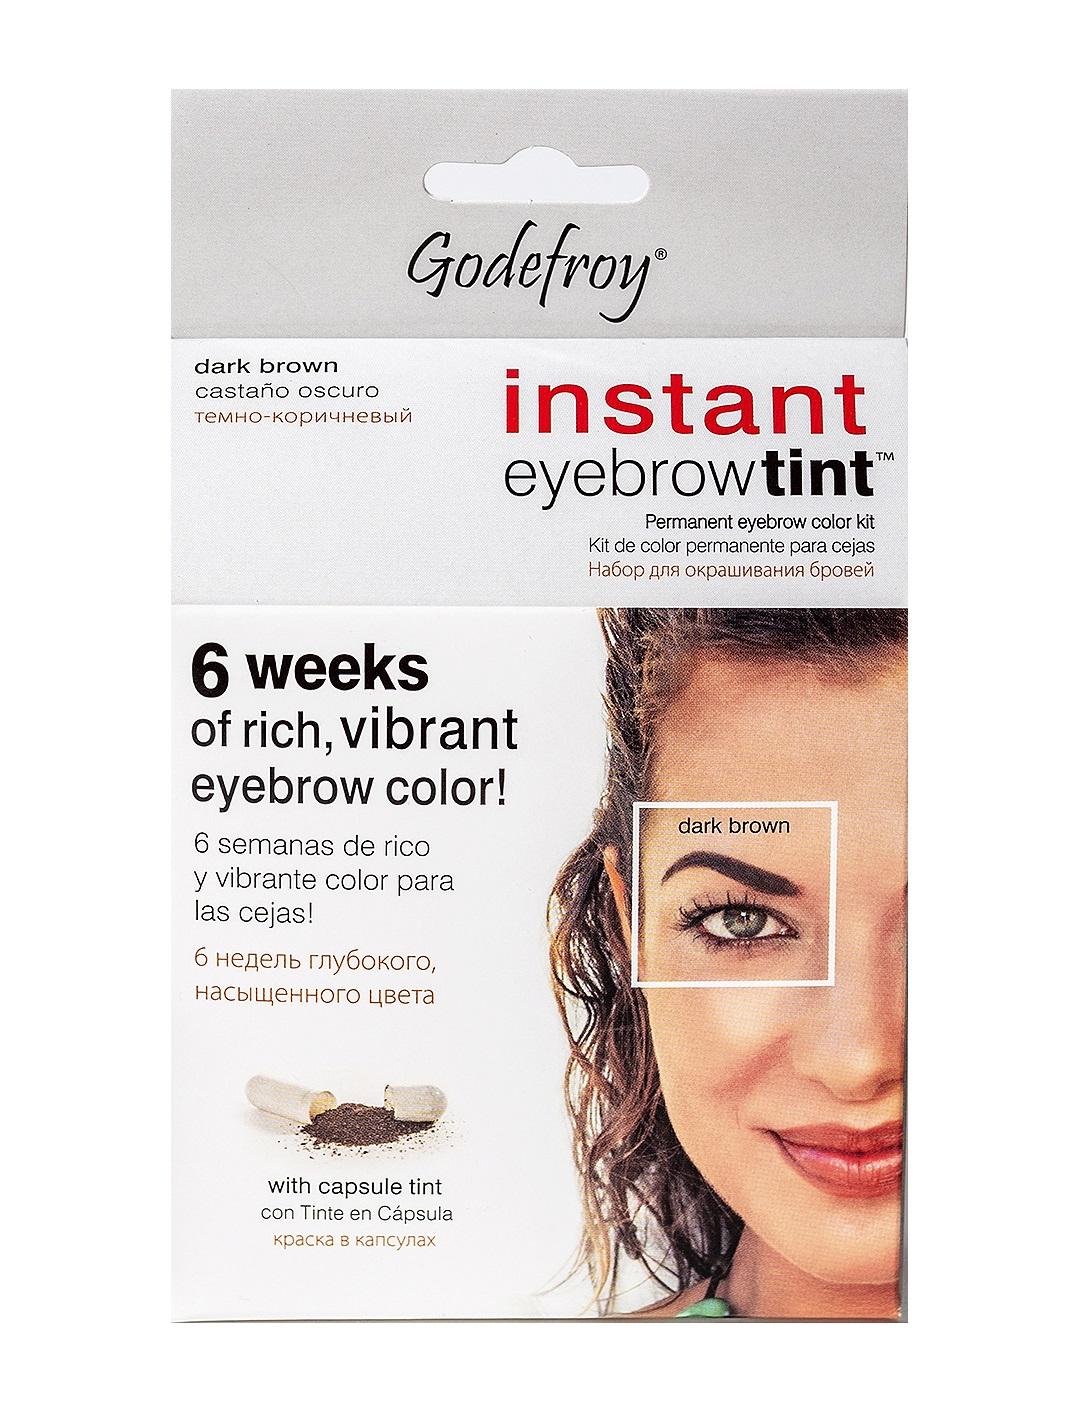 GODEFROY Краска-хна в капсулах для ресниц и бровей, набор (тем-корич) 15шт./ Godefroy Eyebrow Tint Dark Brown